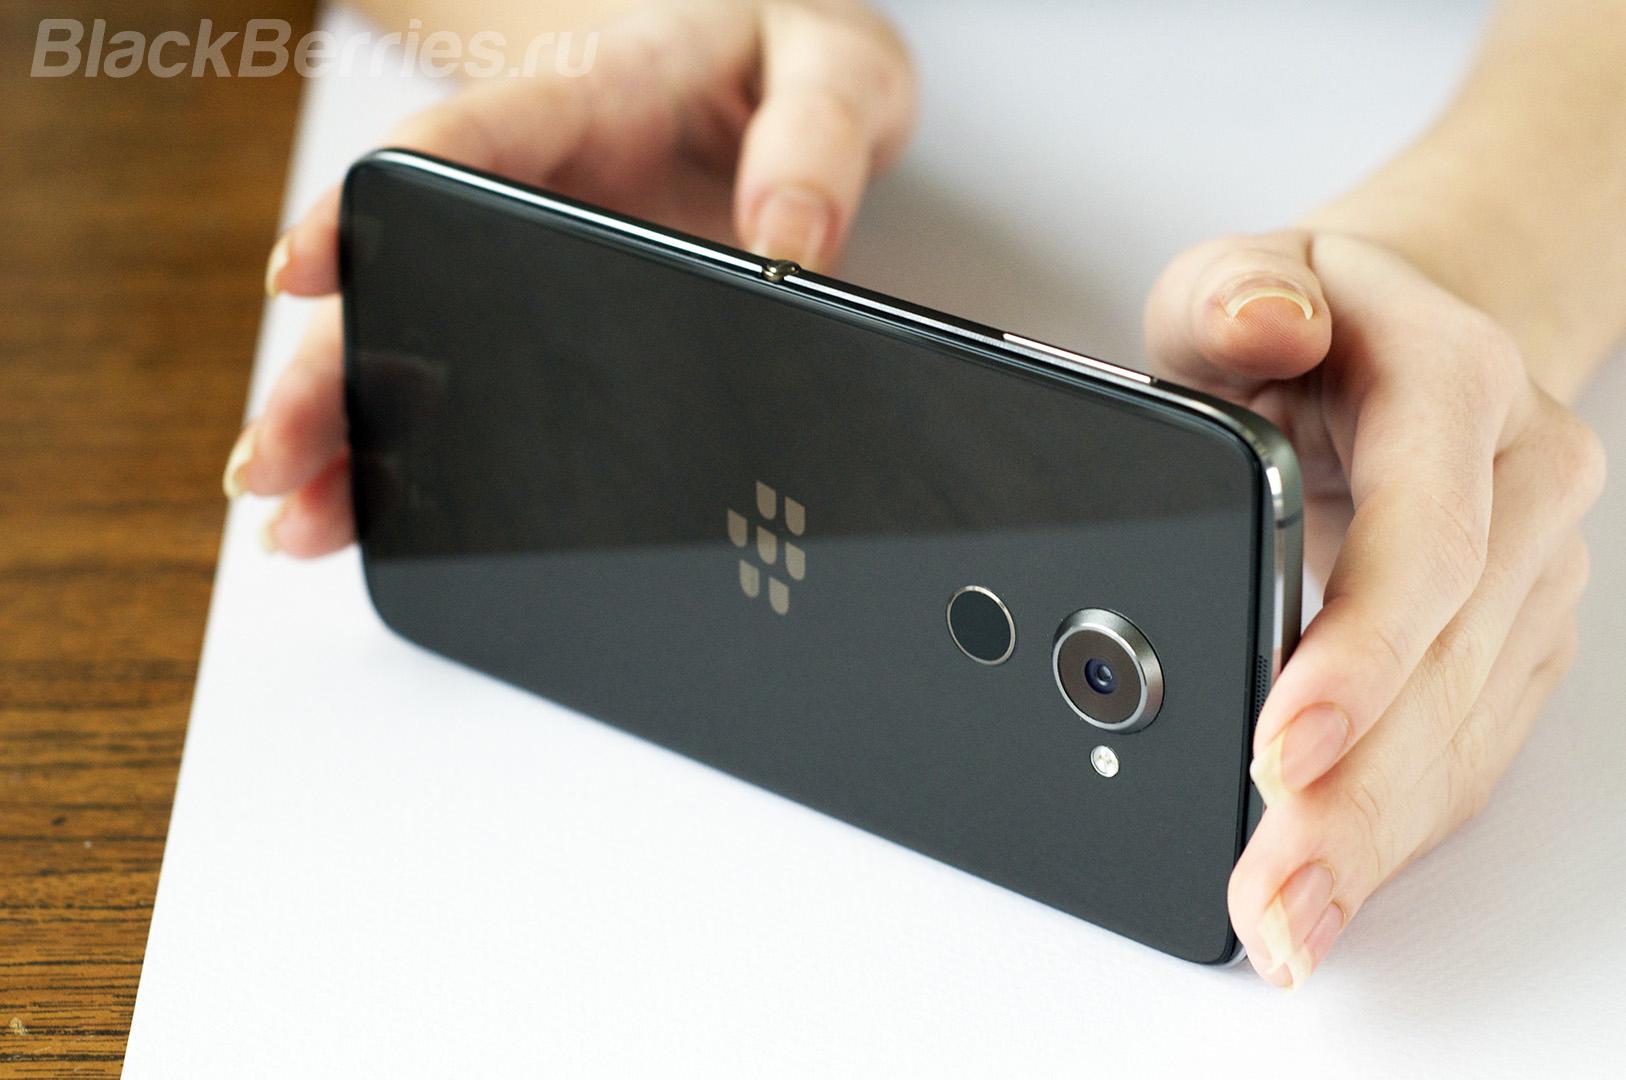 blackberry-dtek60-review-61